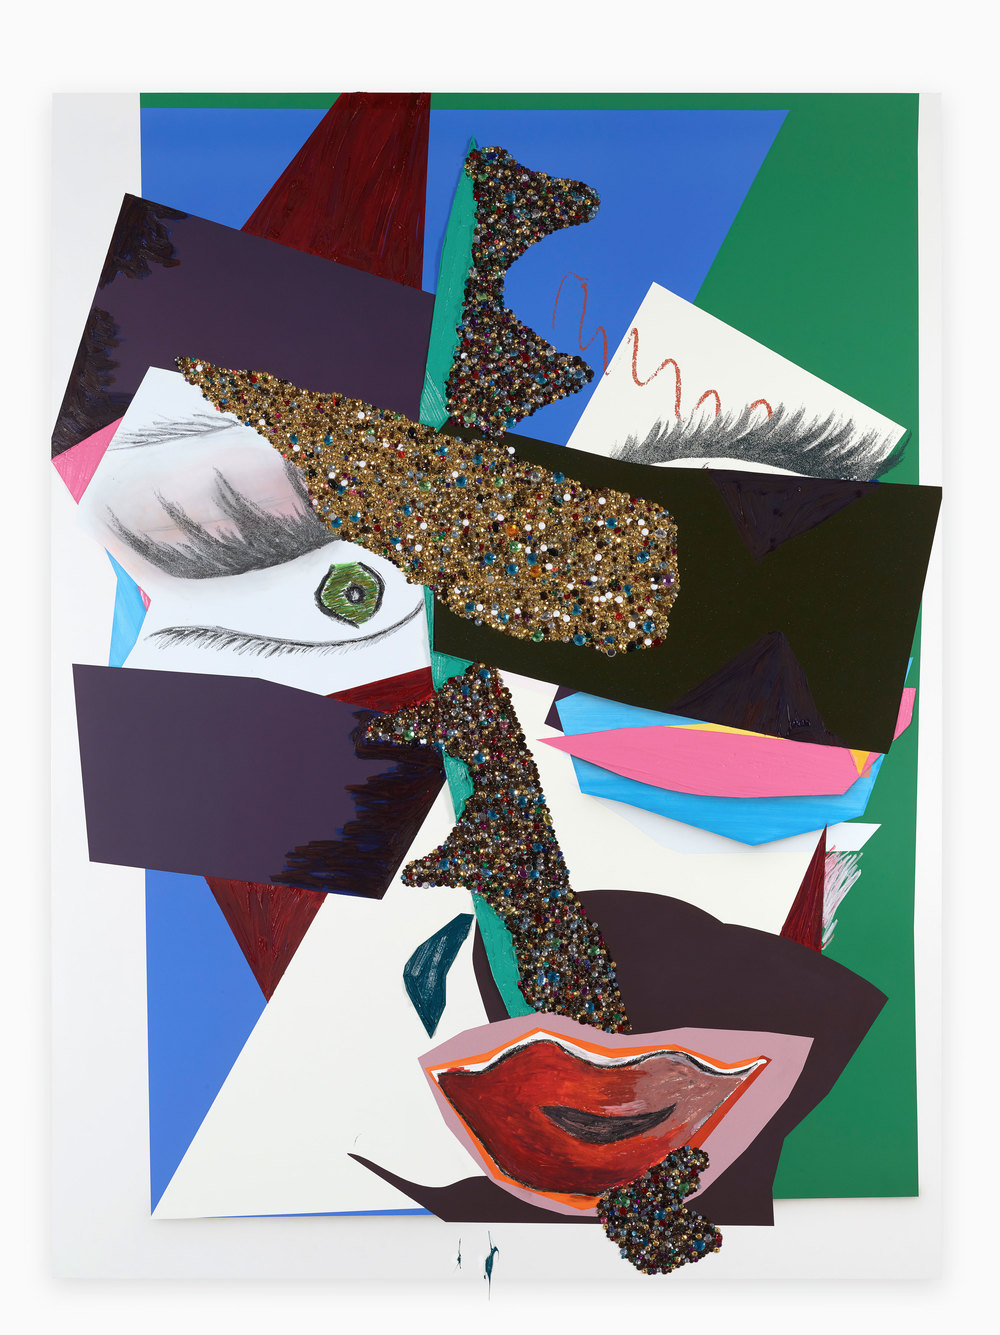 Untitled #12, 2015